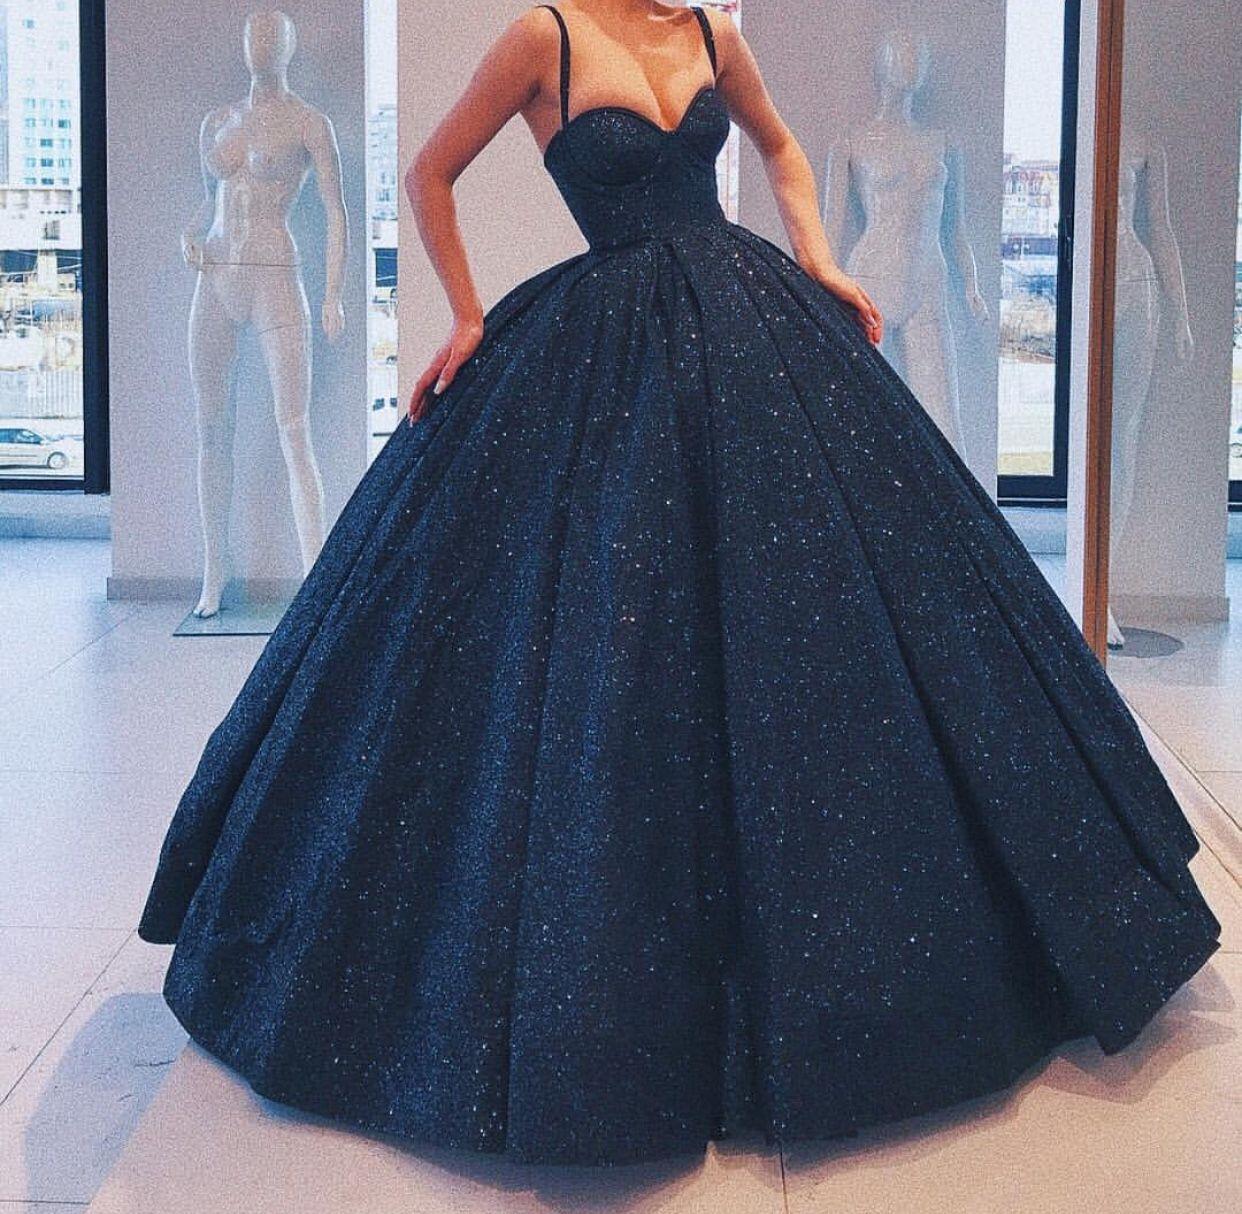 Uauuuhwww Cute Prom Dresses Gowns Sweet 16 Dresses [ 1214 x 1242 Pixel ]